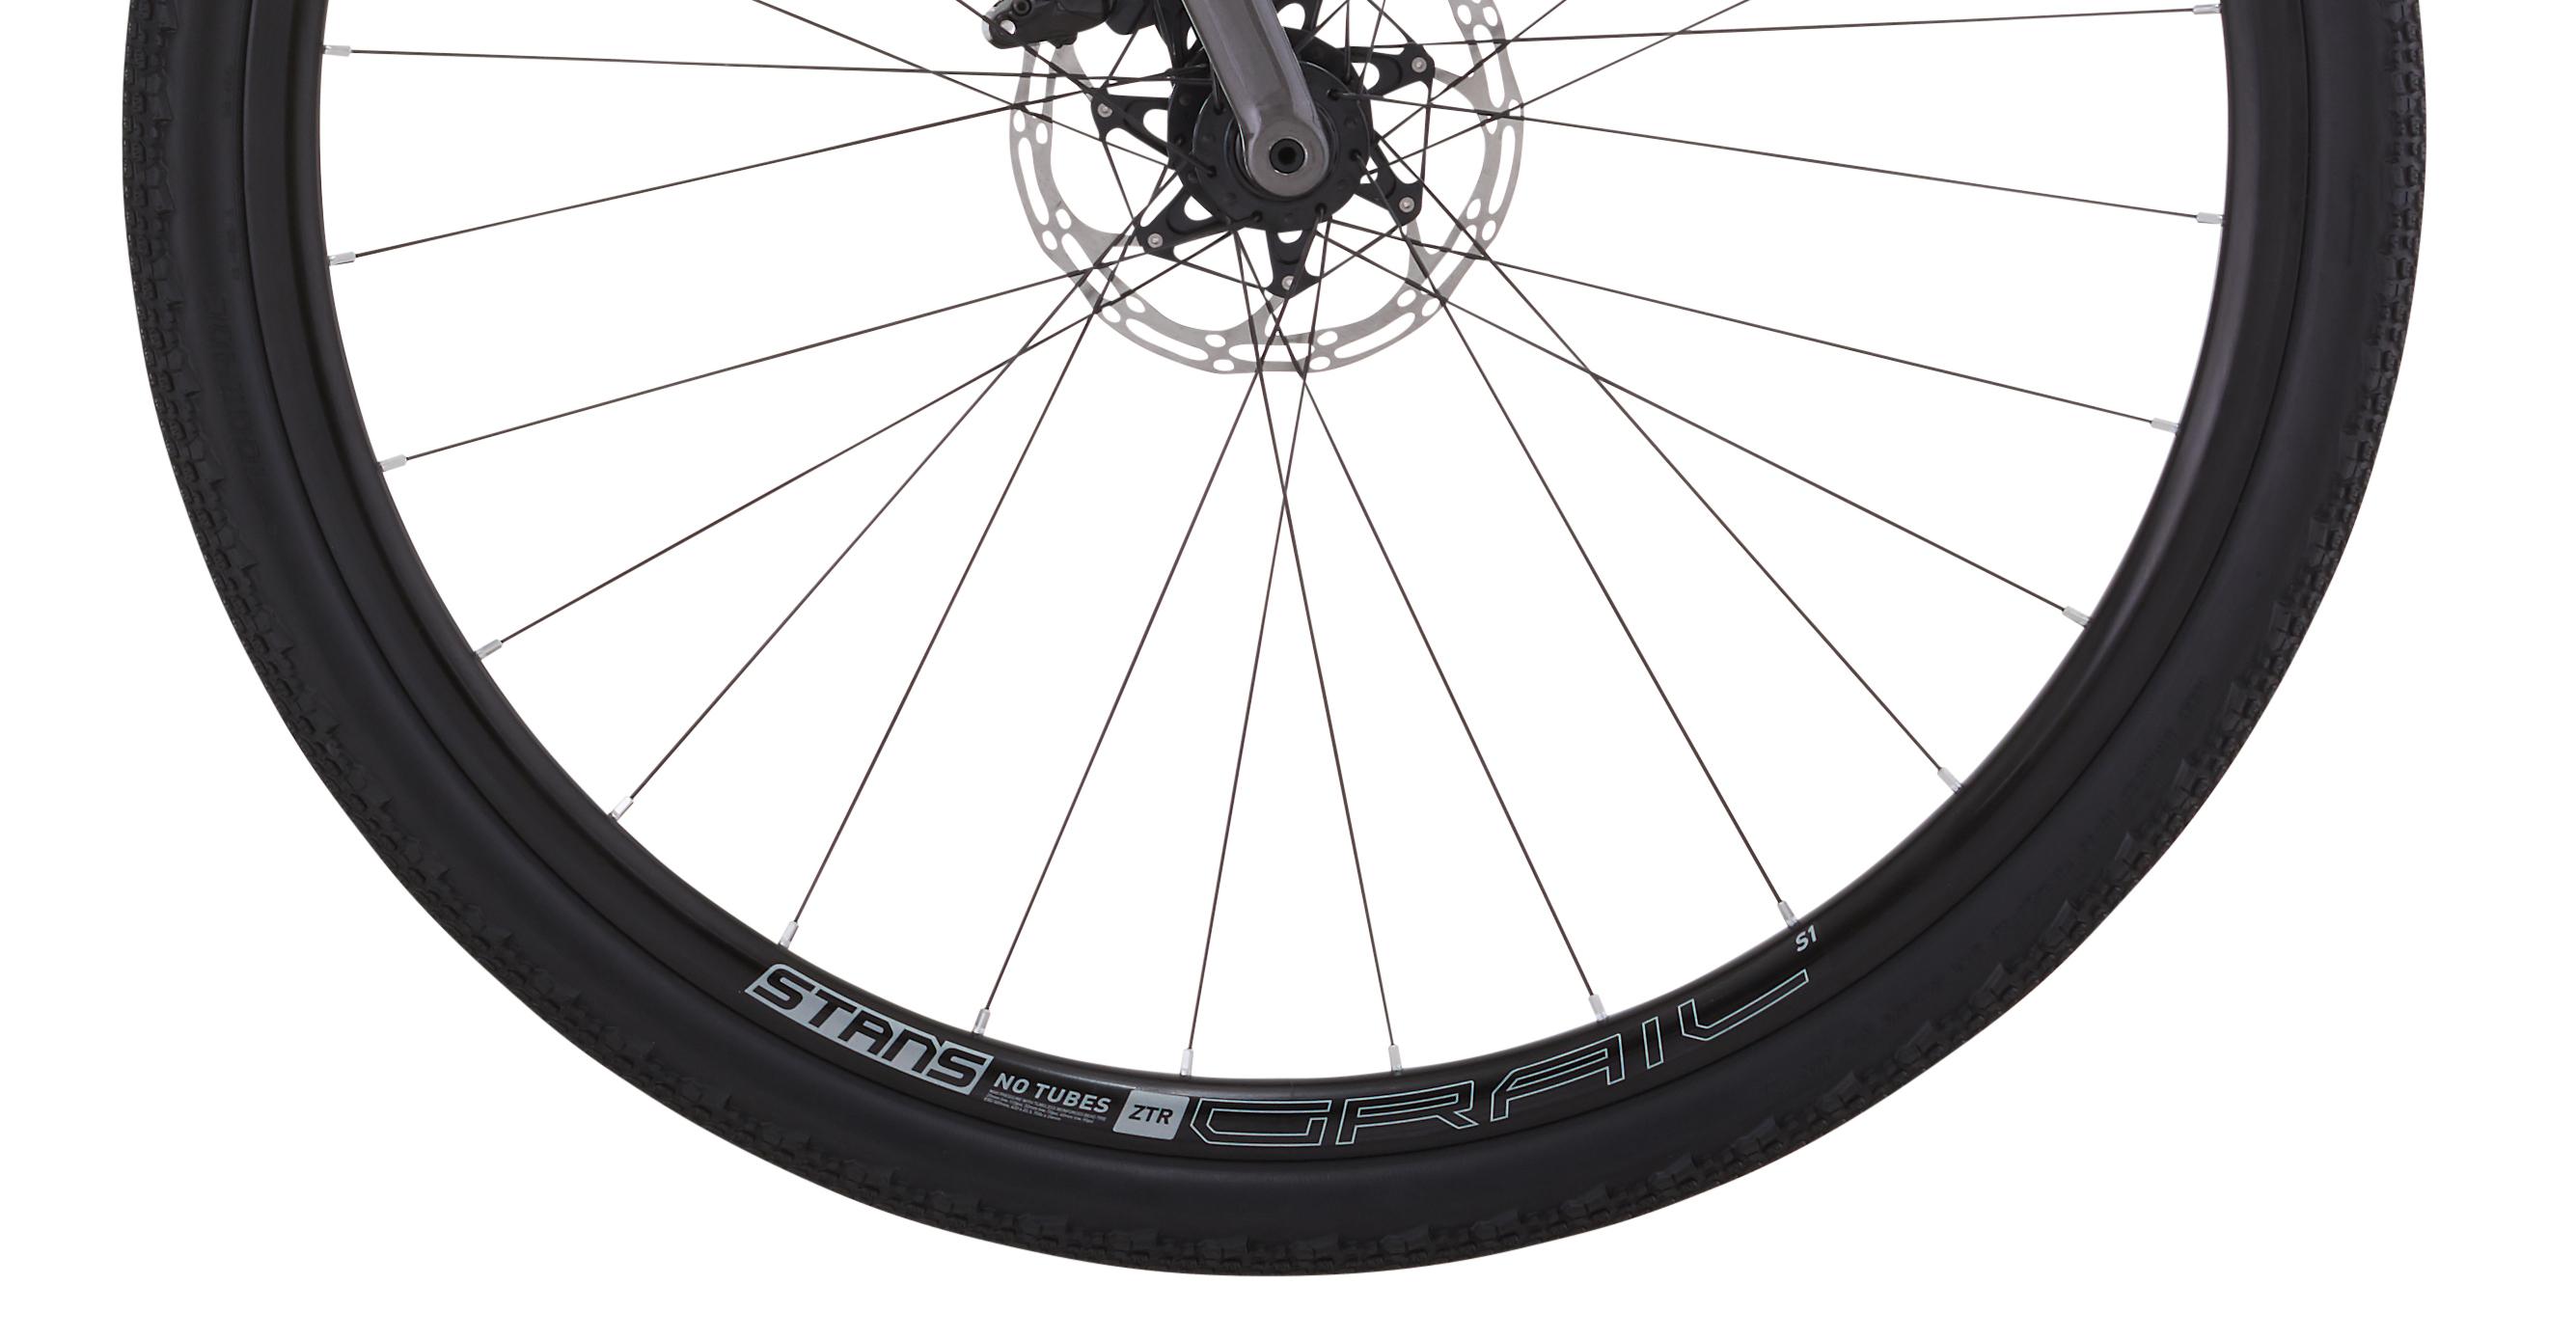 GX3 Stans wheels